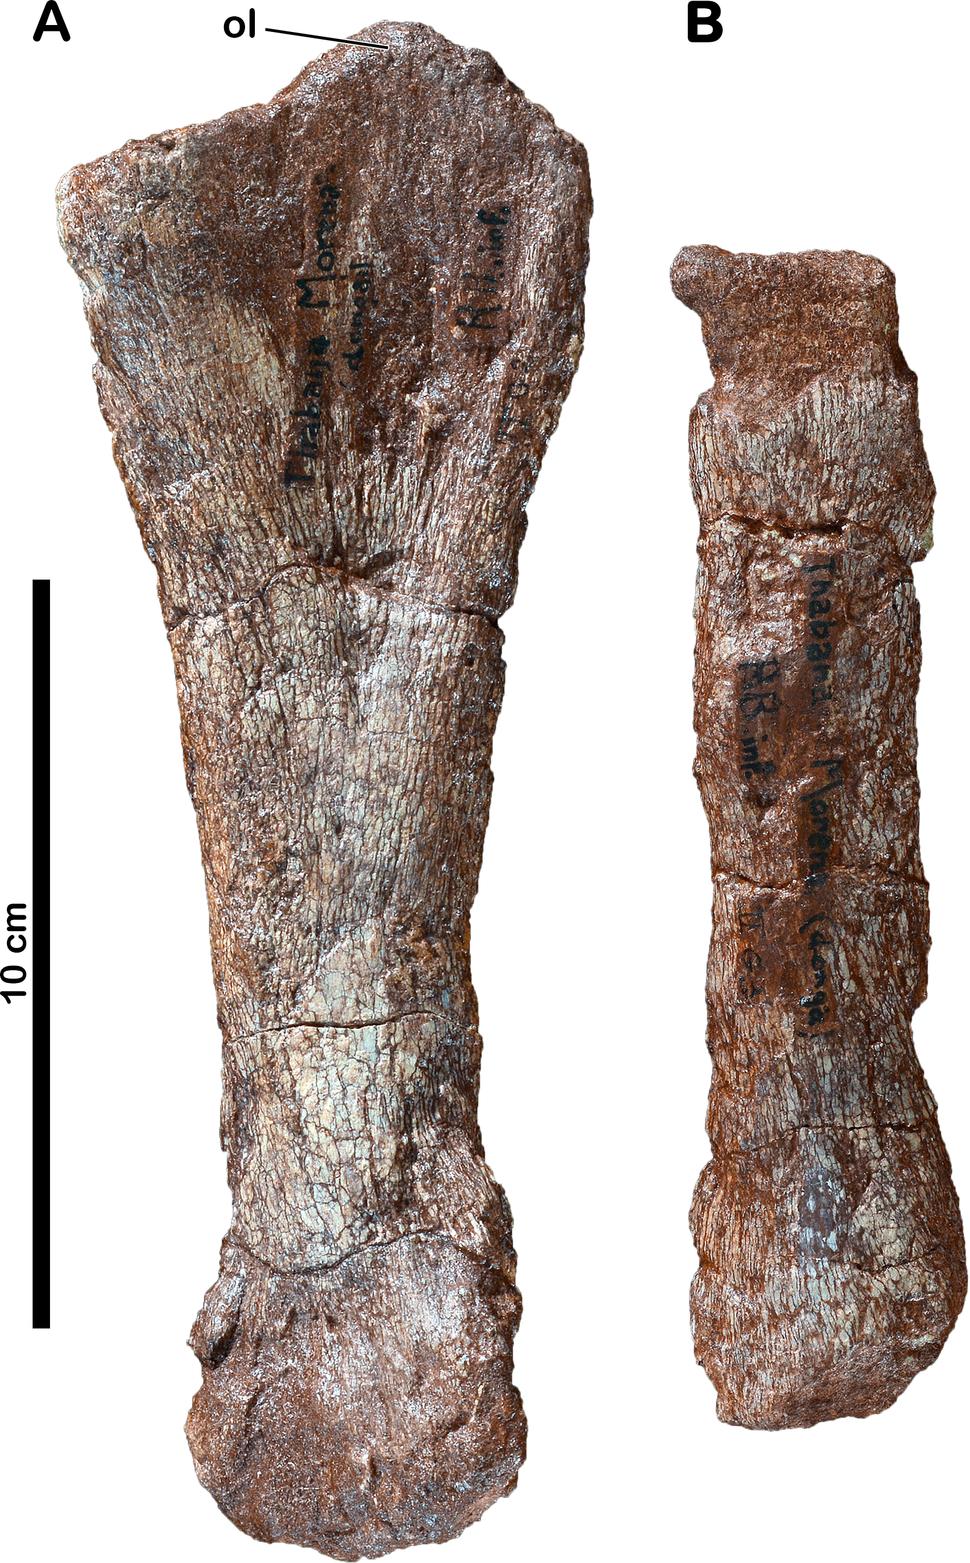 Forelimb bones of Meroktenos